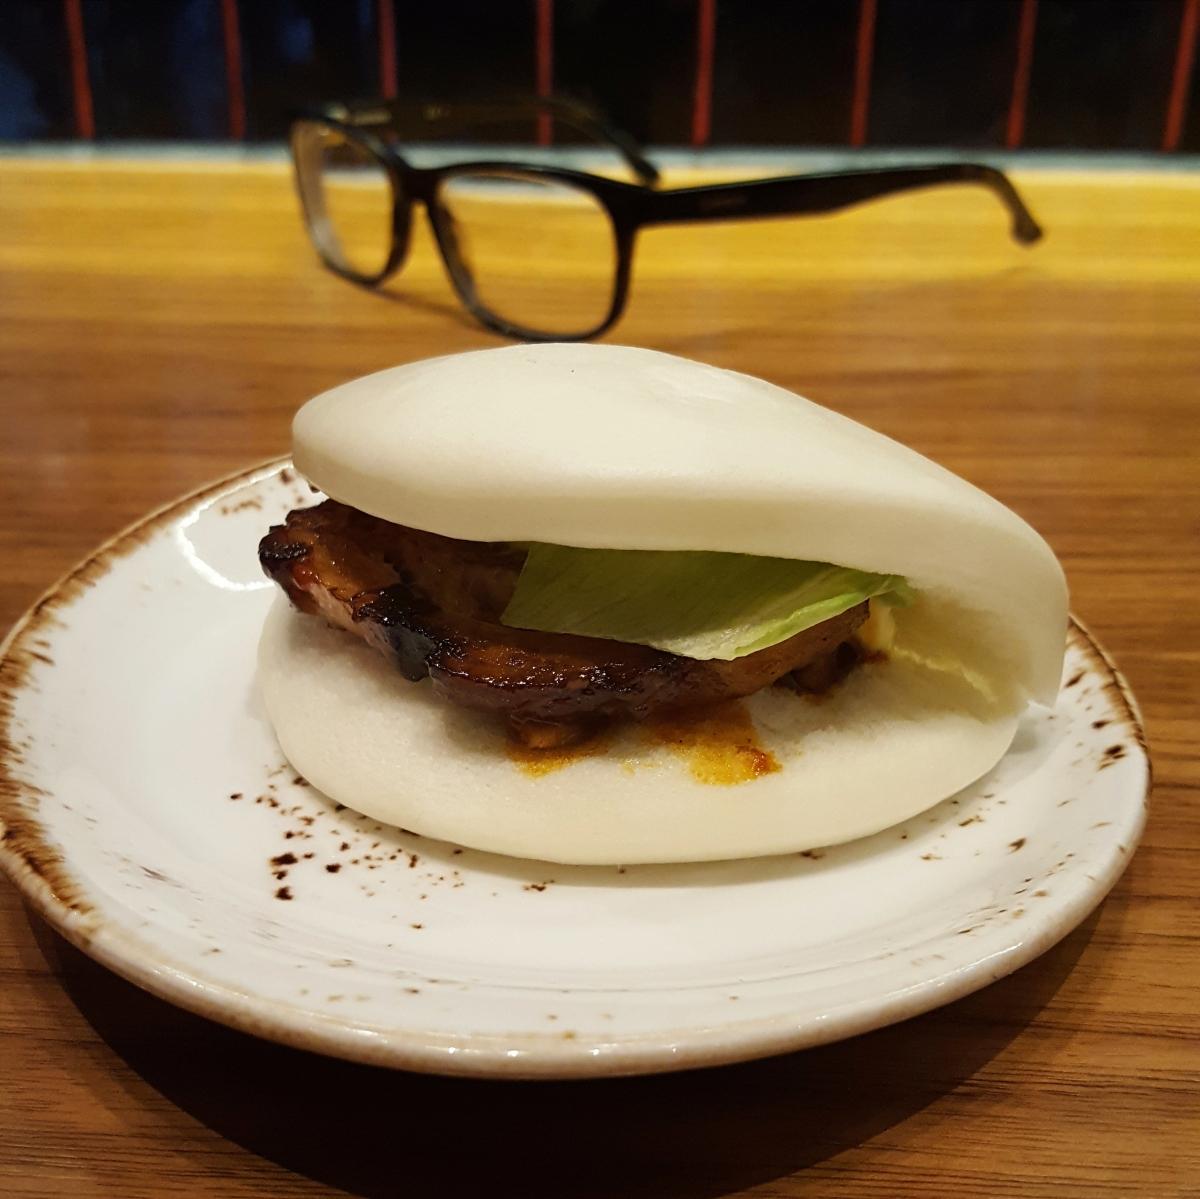 Hirata Pork Bun from Ippudo